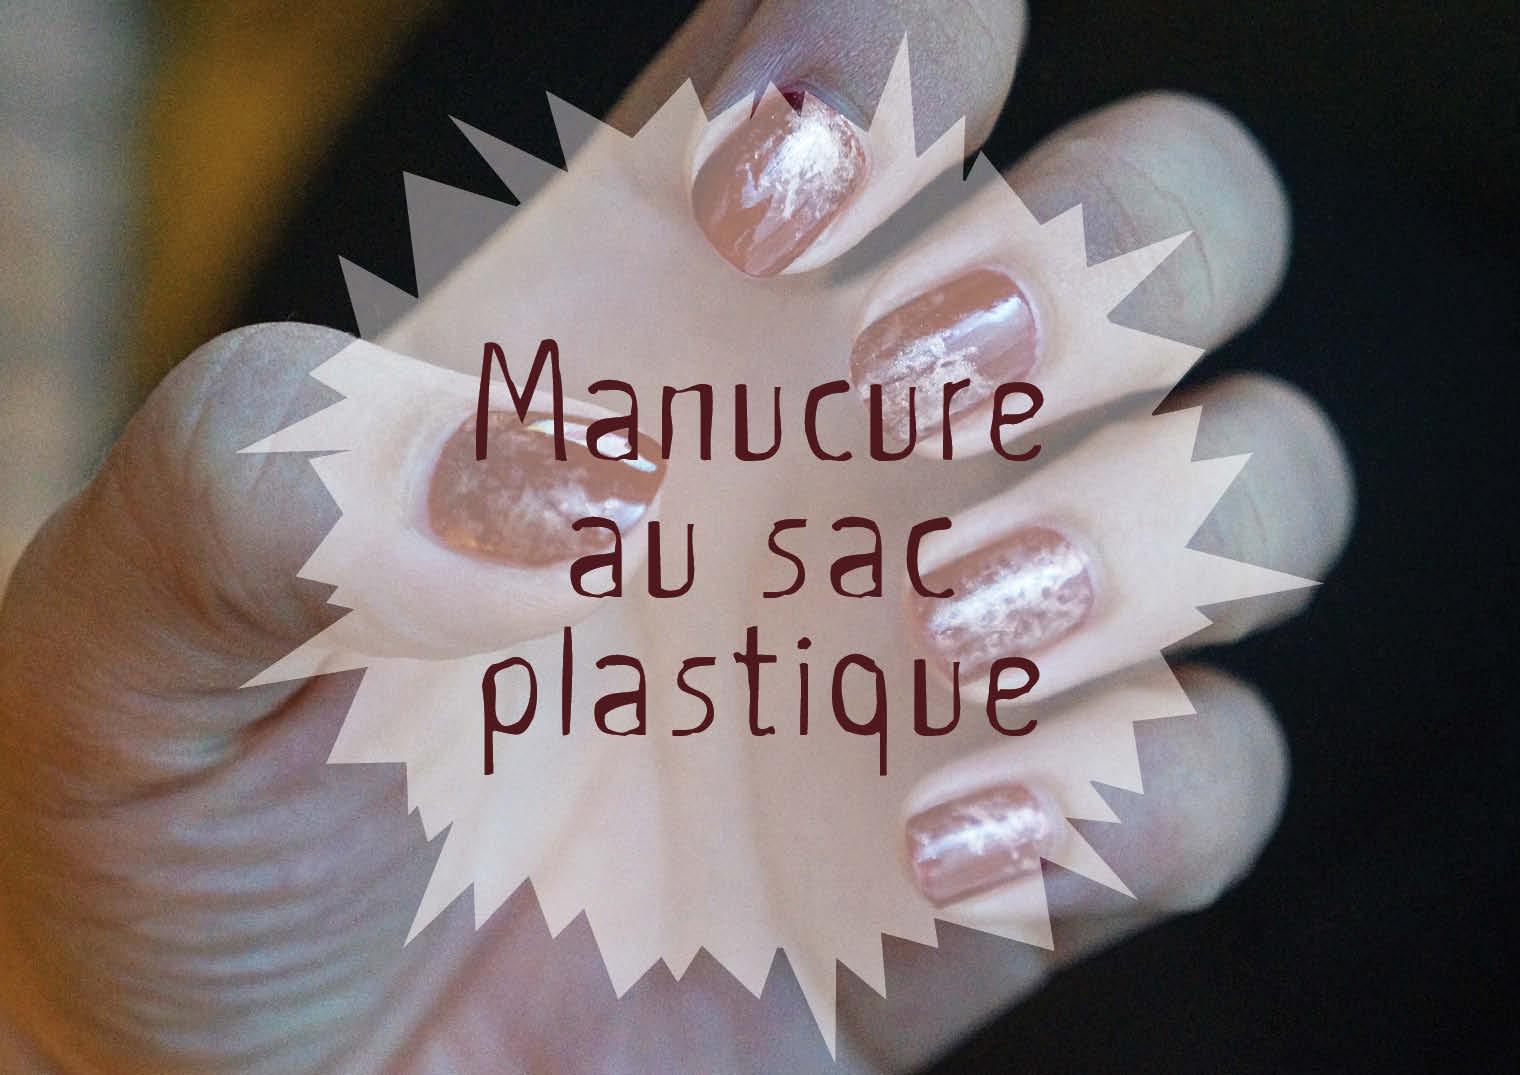 Top Une manucure au sac plastique, si si ! | So made up CN24